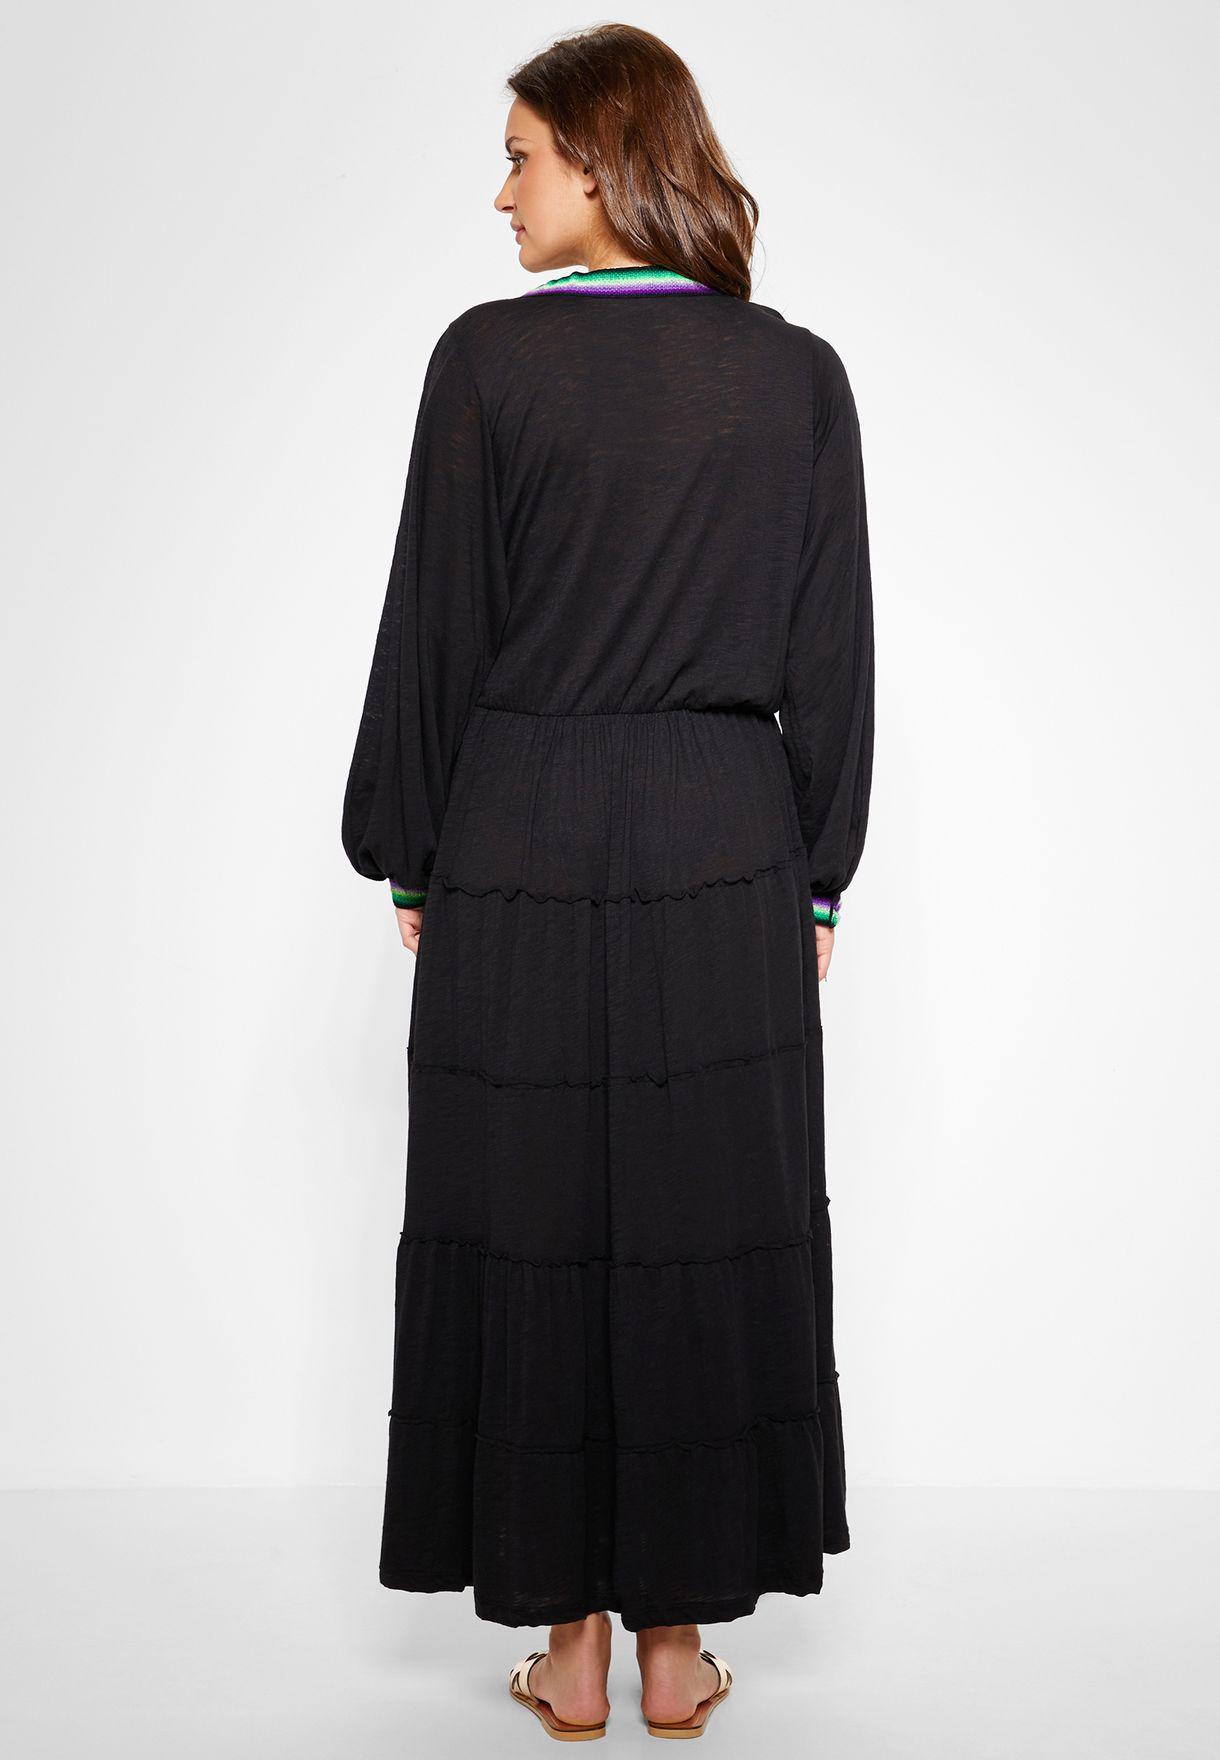 Plunge Dress